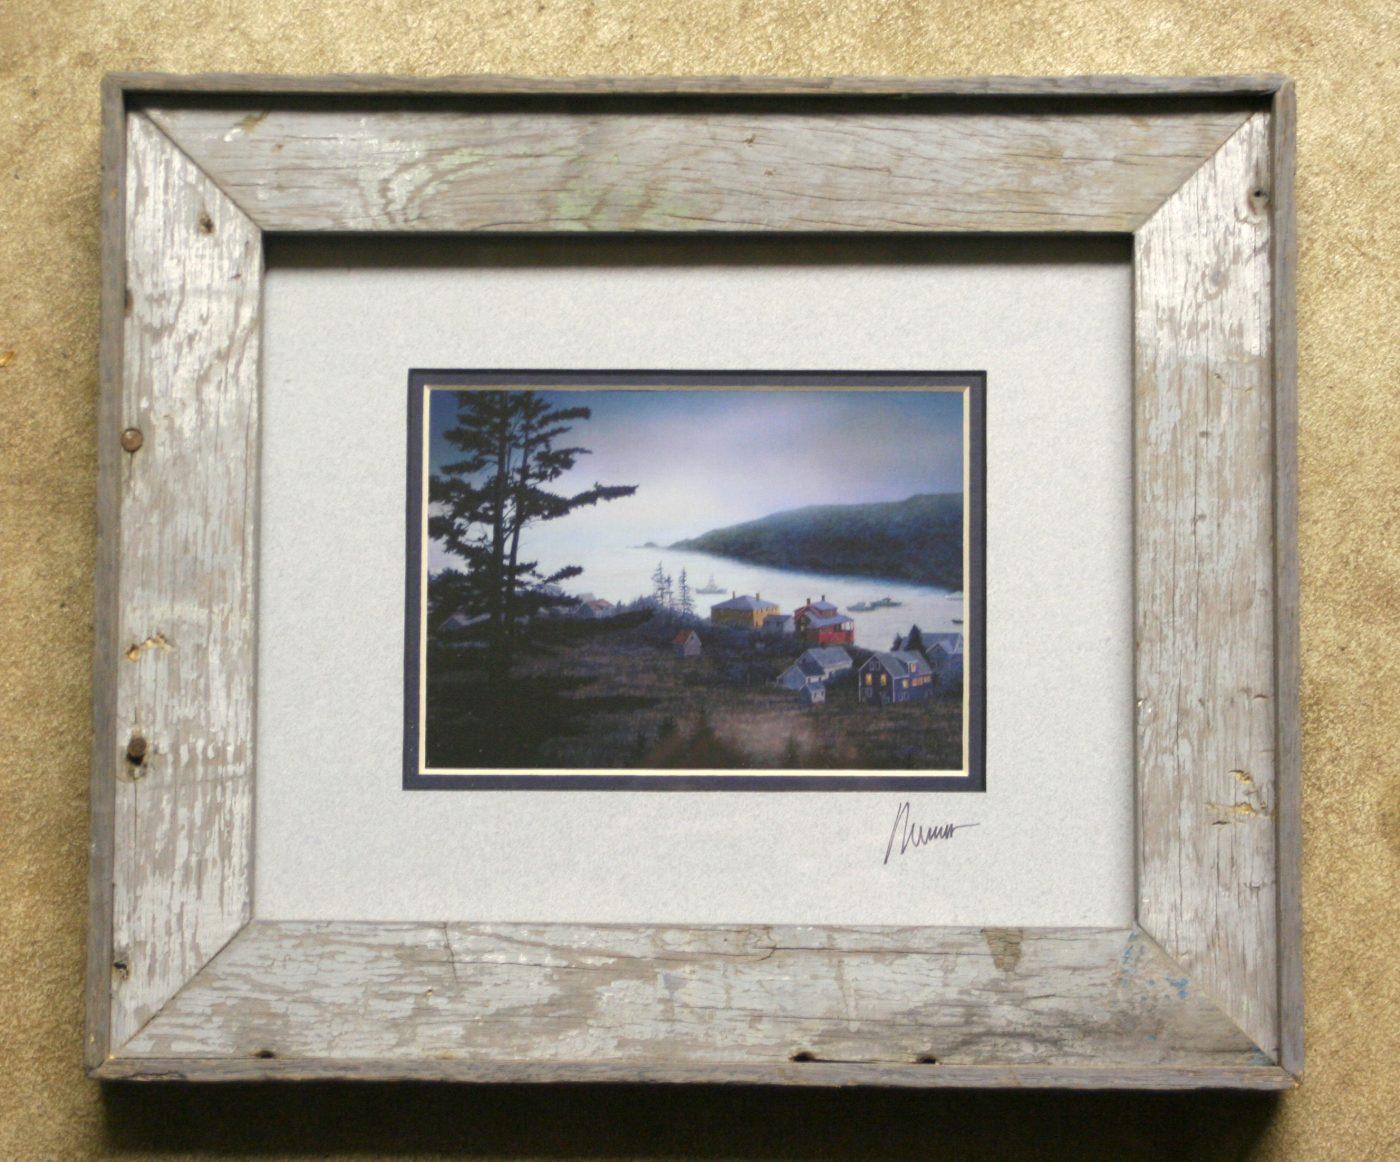 Barnwood Frame with Village